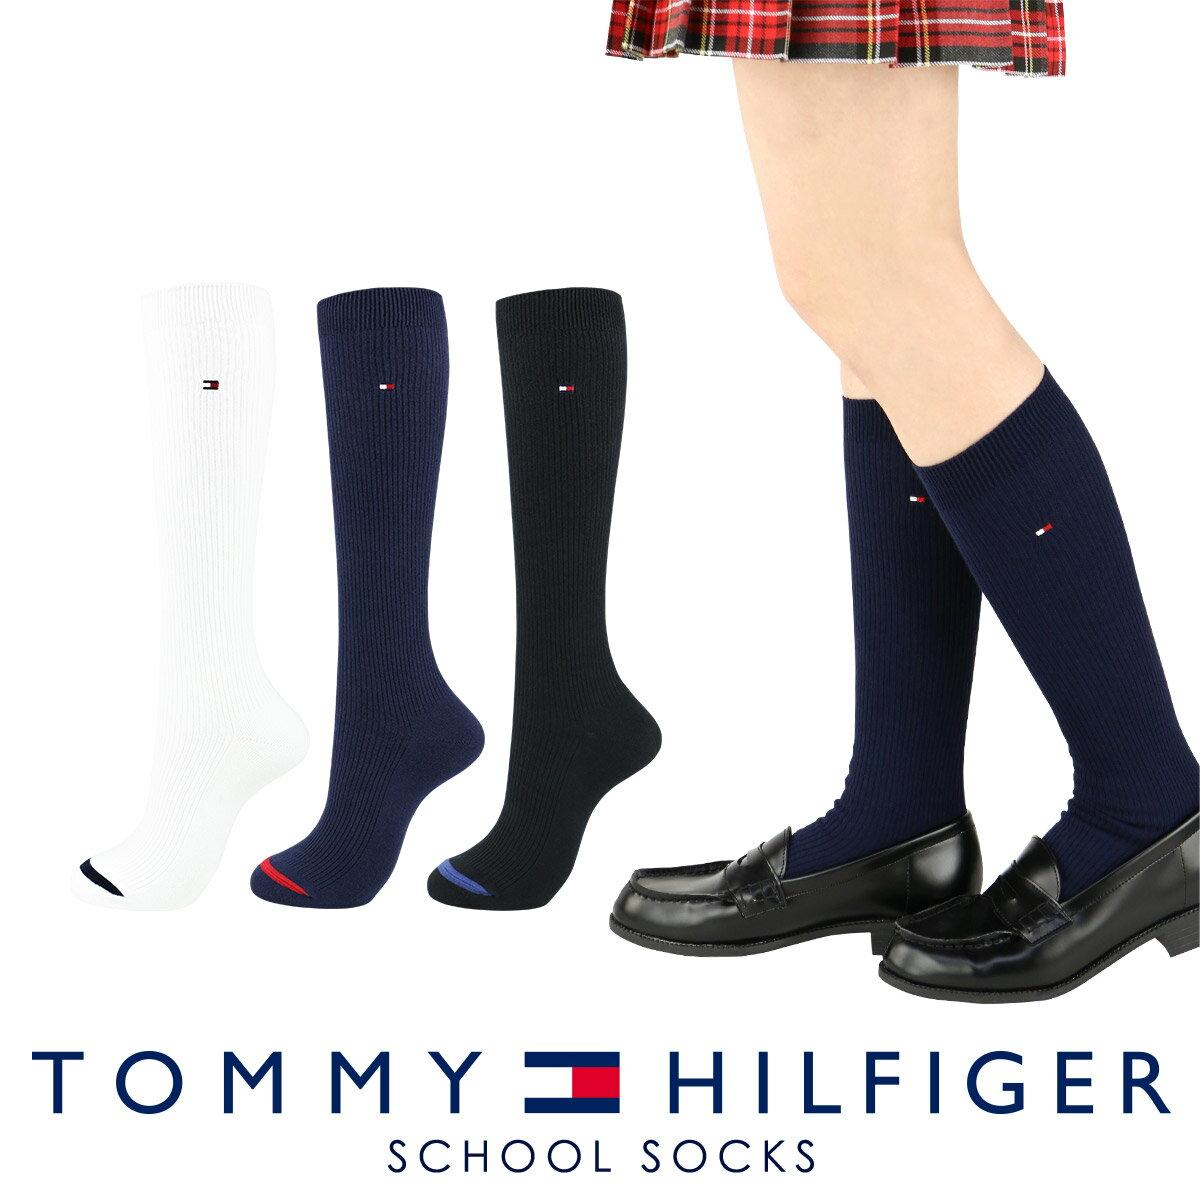 TOMMY HILFIGER|トミーヒルフィガー スクールソックスワンポイント 刺繍 36cm丈 レディス ハイソックス 靴下3481-605ホワイトデー お返し プレゼントポイント10倍